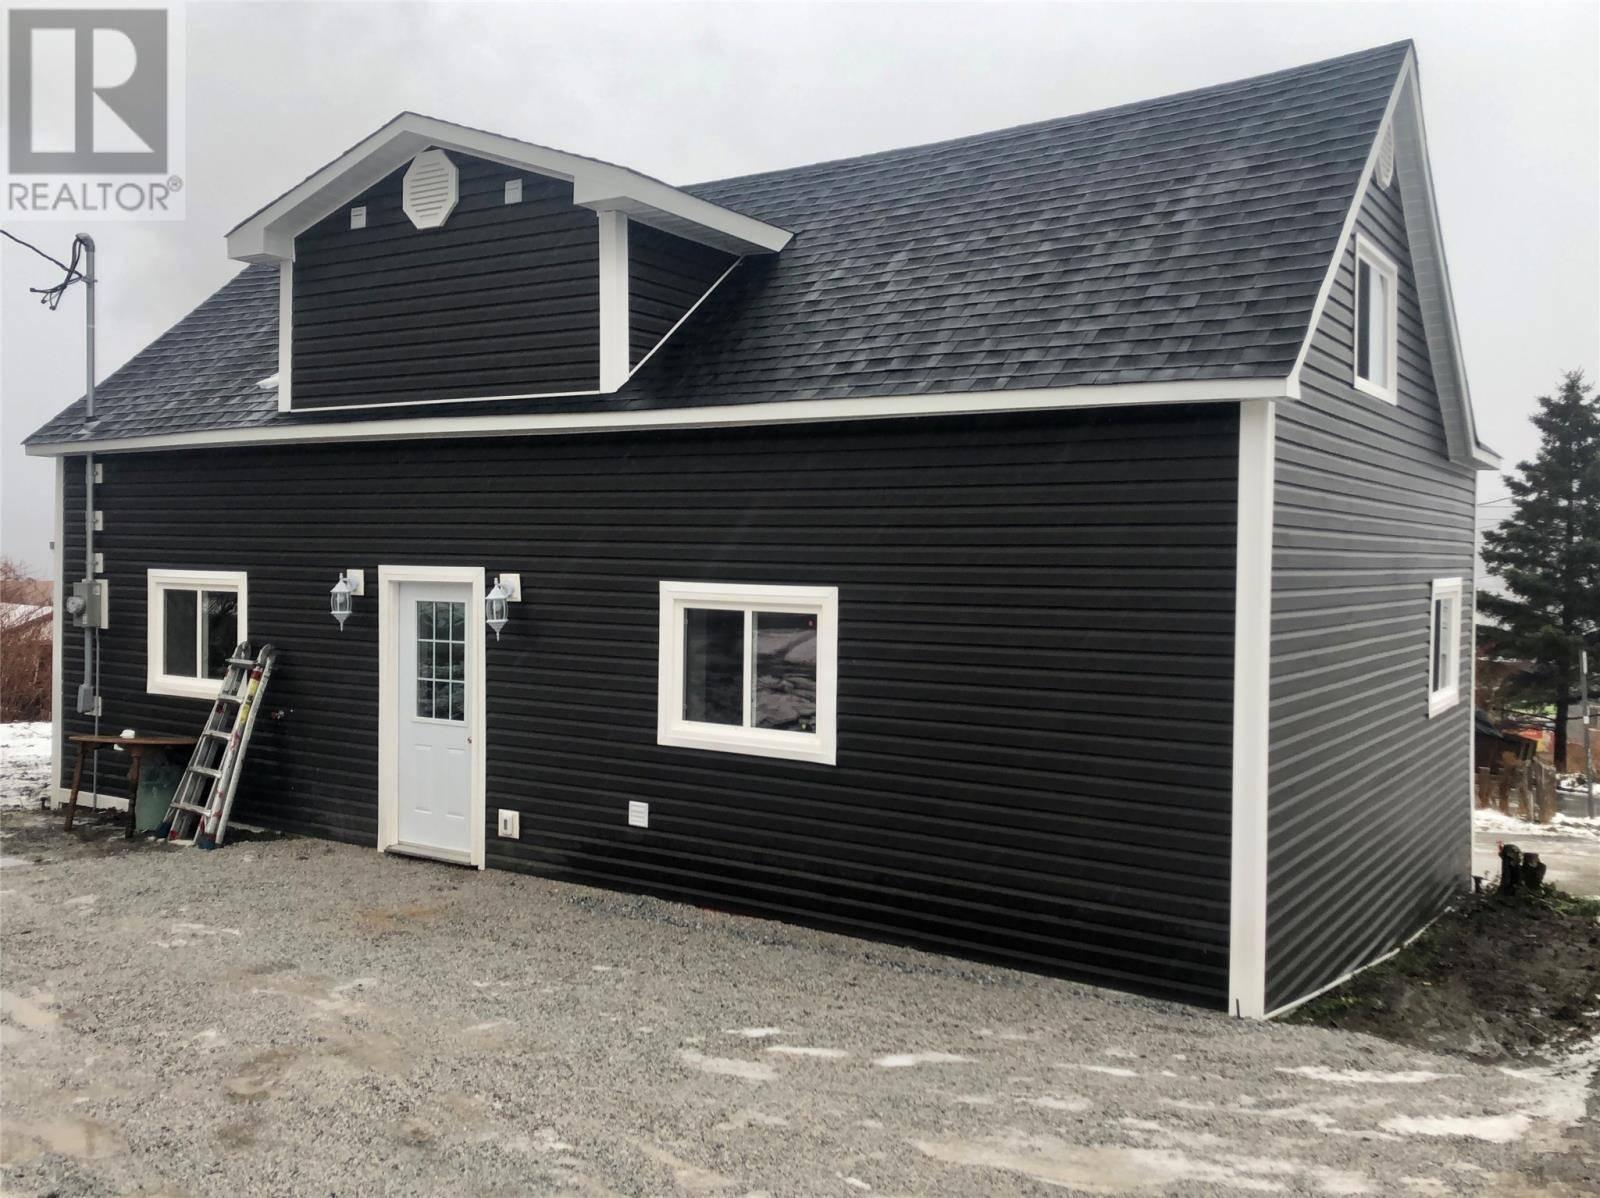 House for sale at 12 West Ave Corner Brook Newfoundland - MLS: 1207396